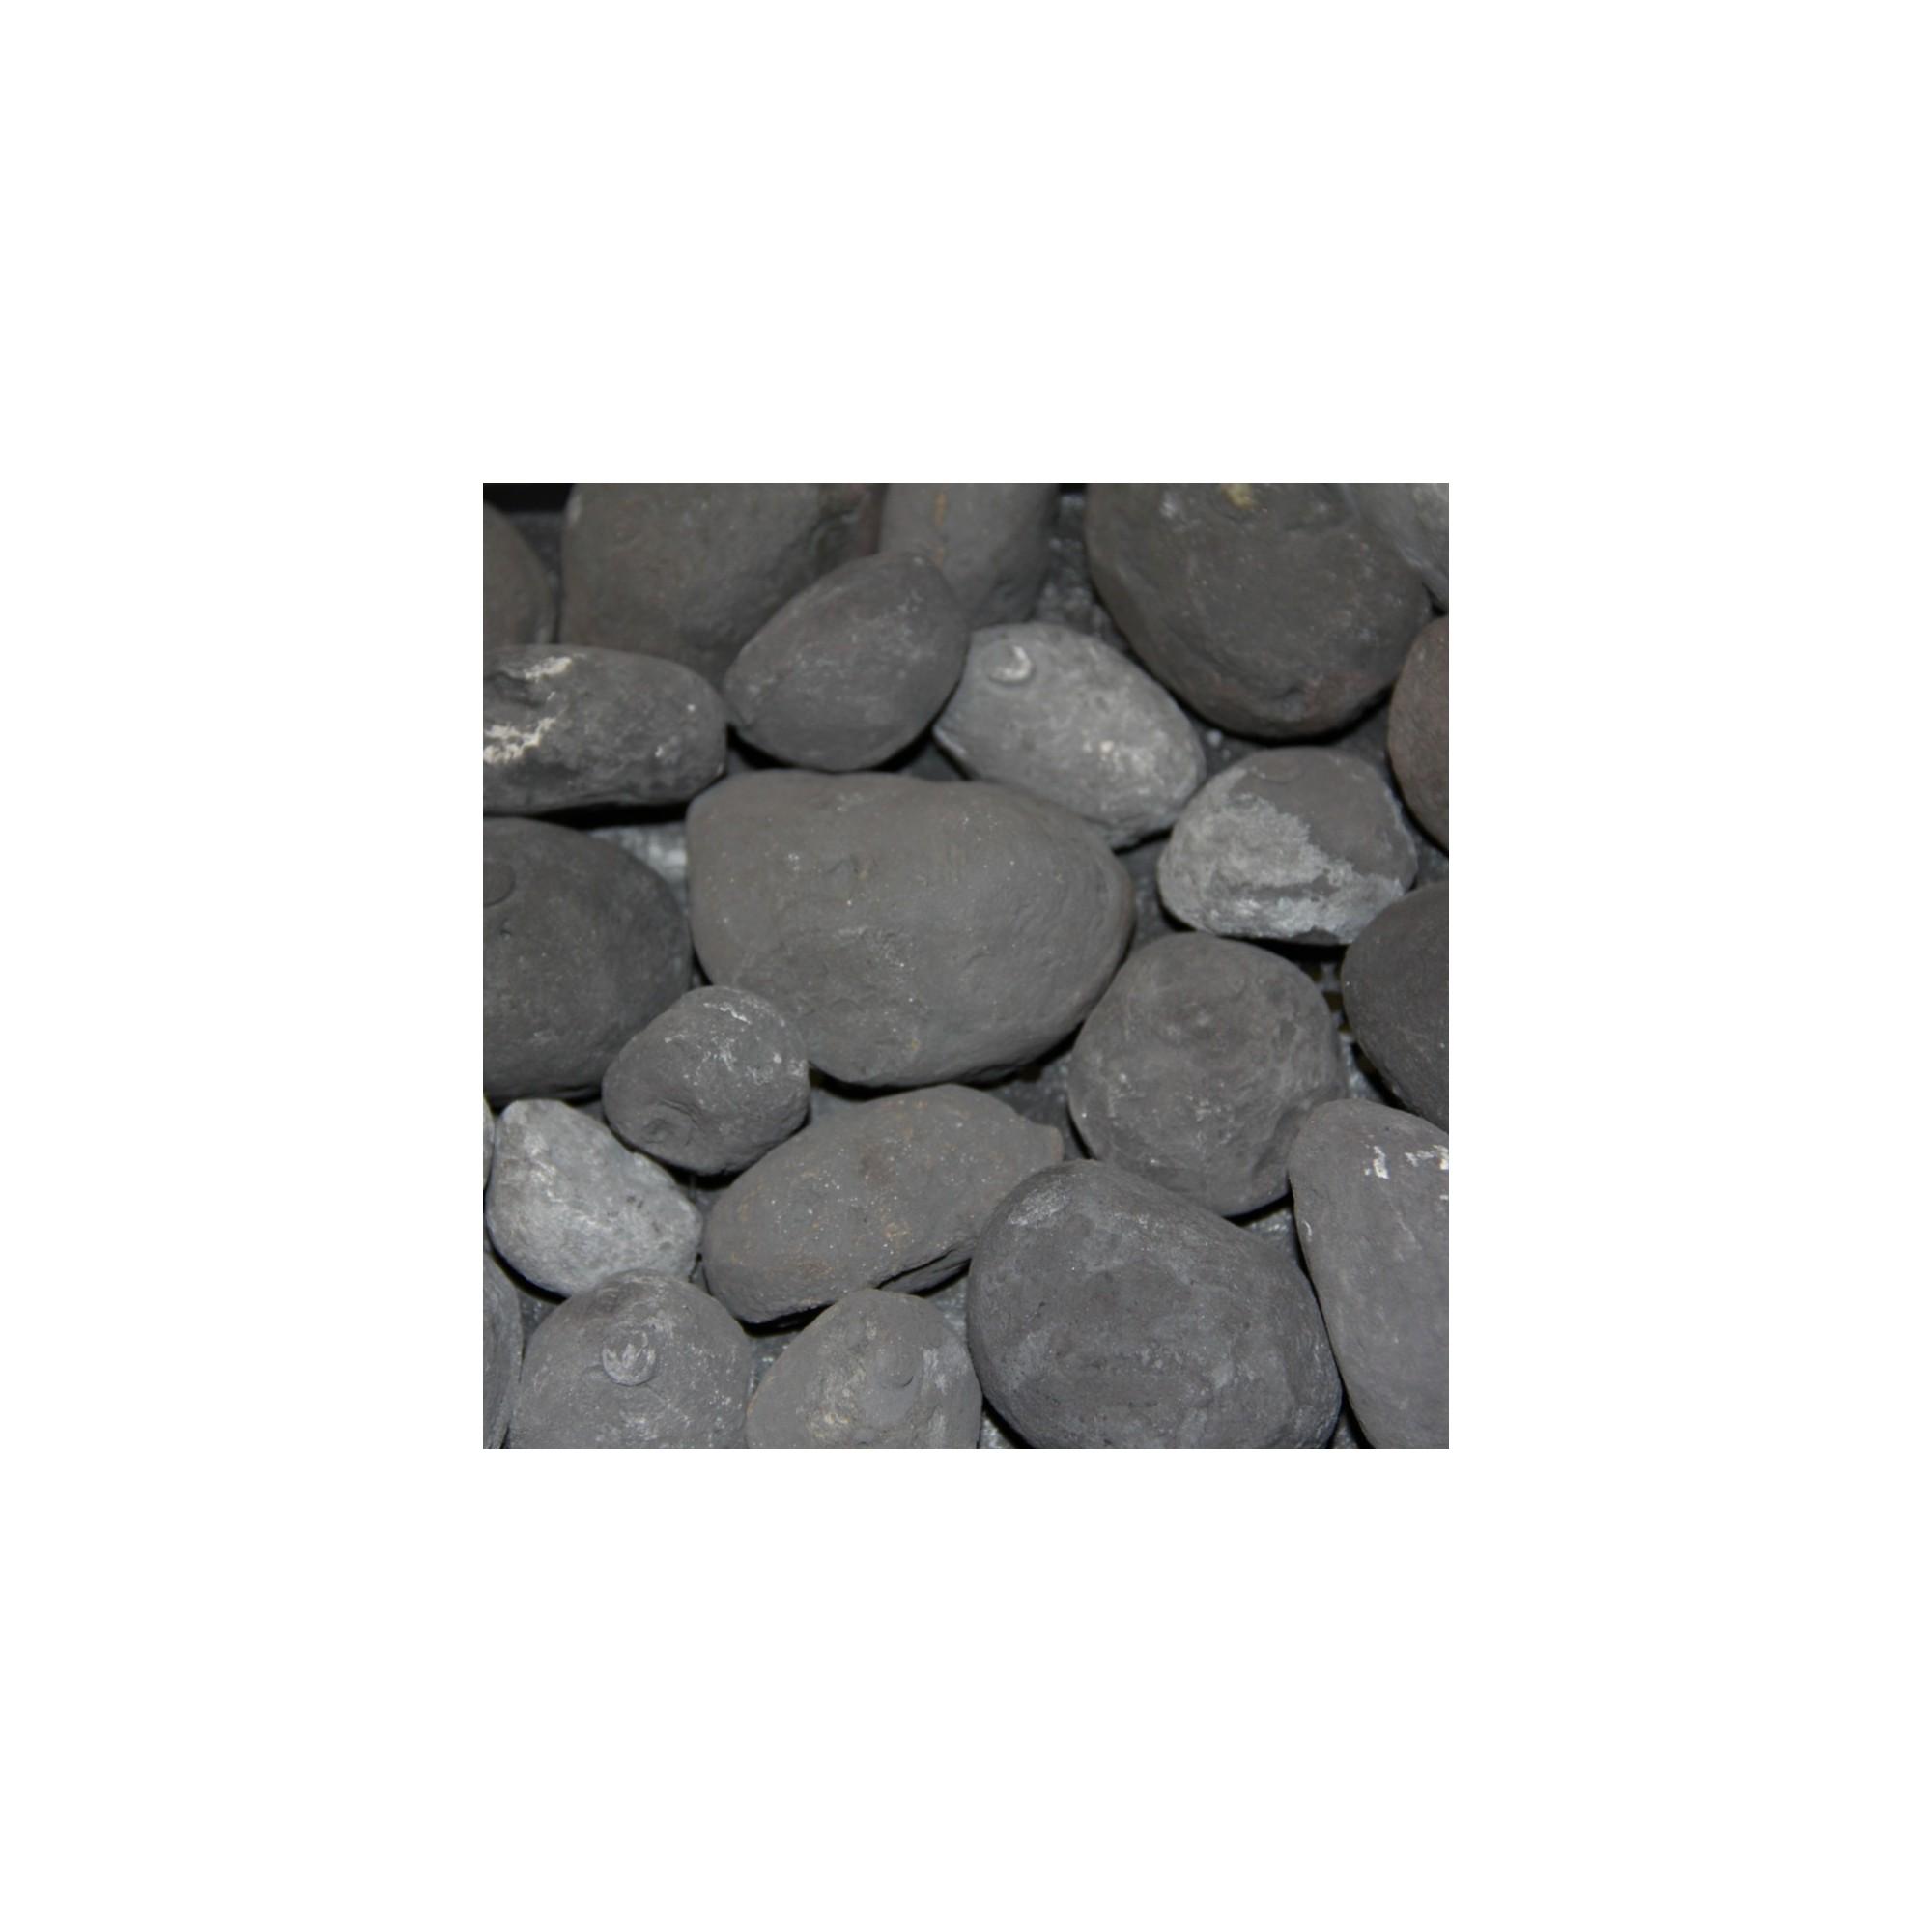 COAL A8 / M - A19M / ME - K19M - K96 / M / MF / S - K98 / E / M - KM80